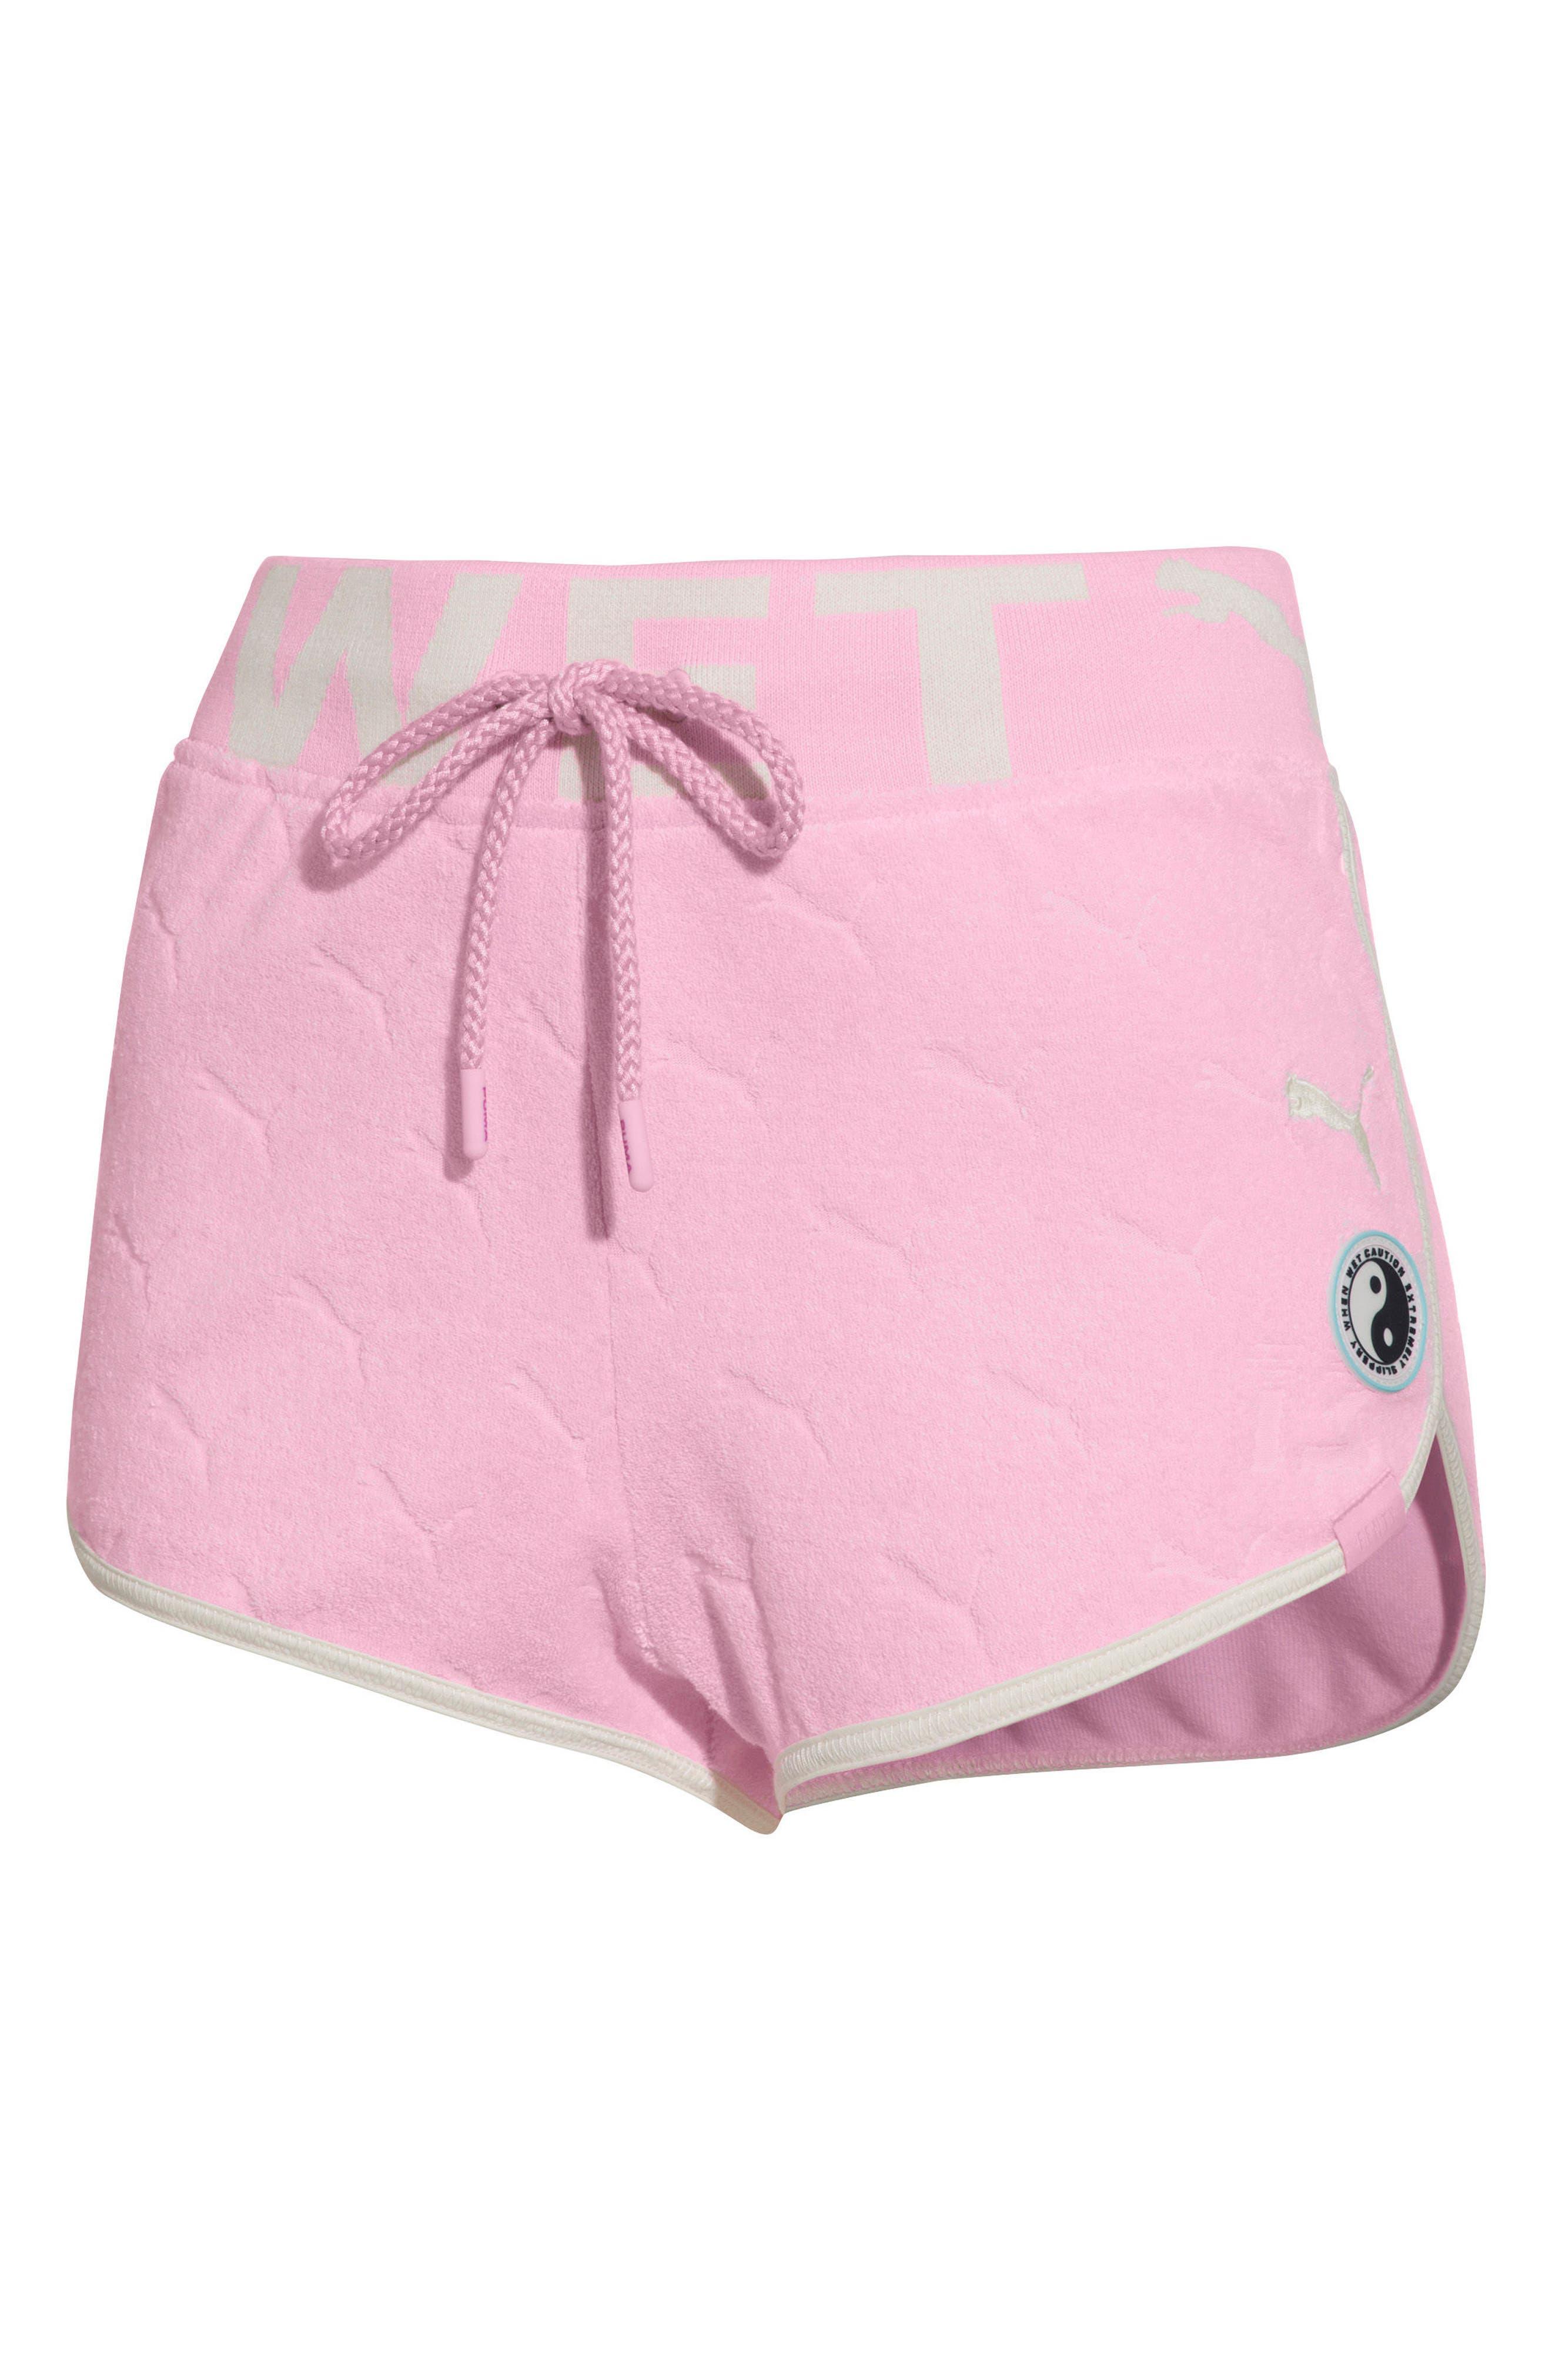 PUMA by Rihanna Terry Cloth Dolphin Shorts,                             Main thumbnail 1, color,